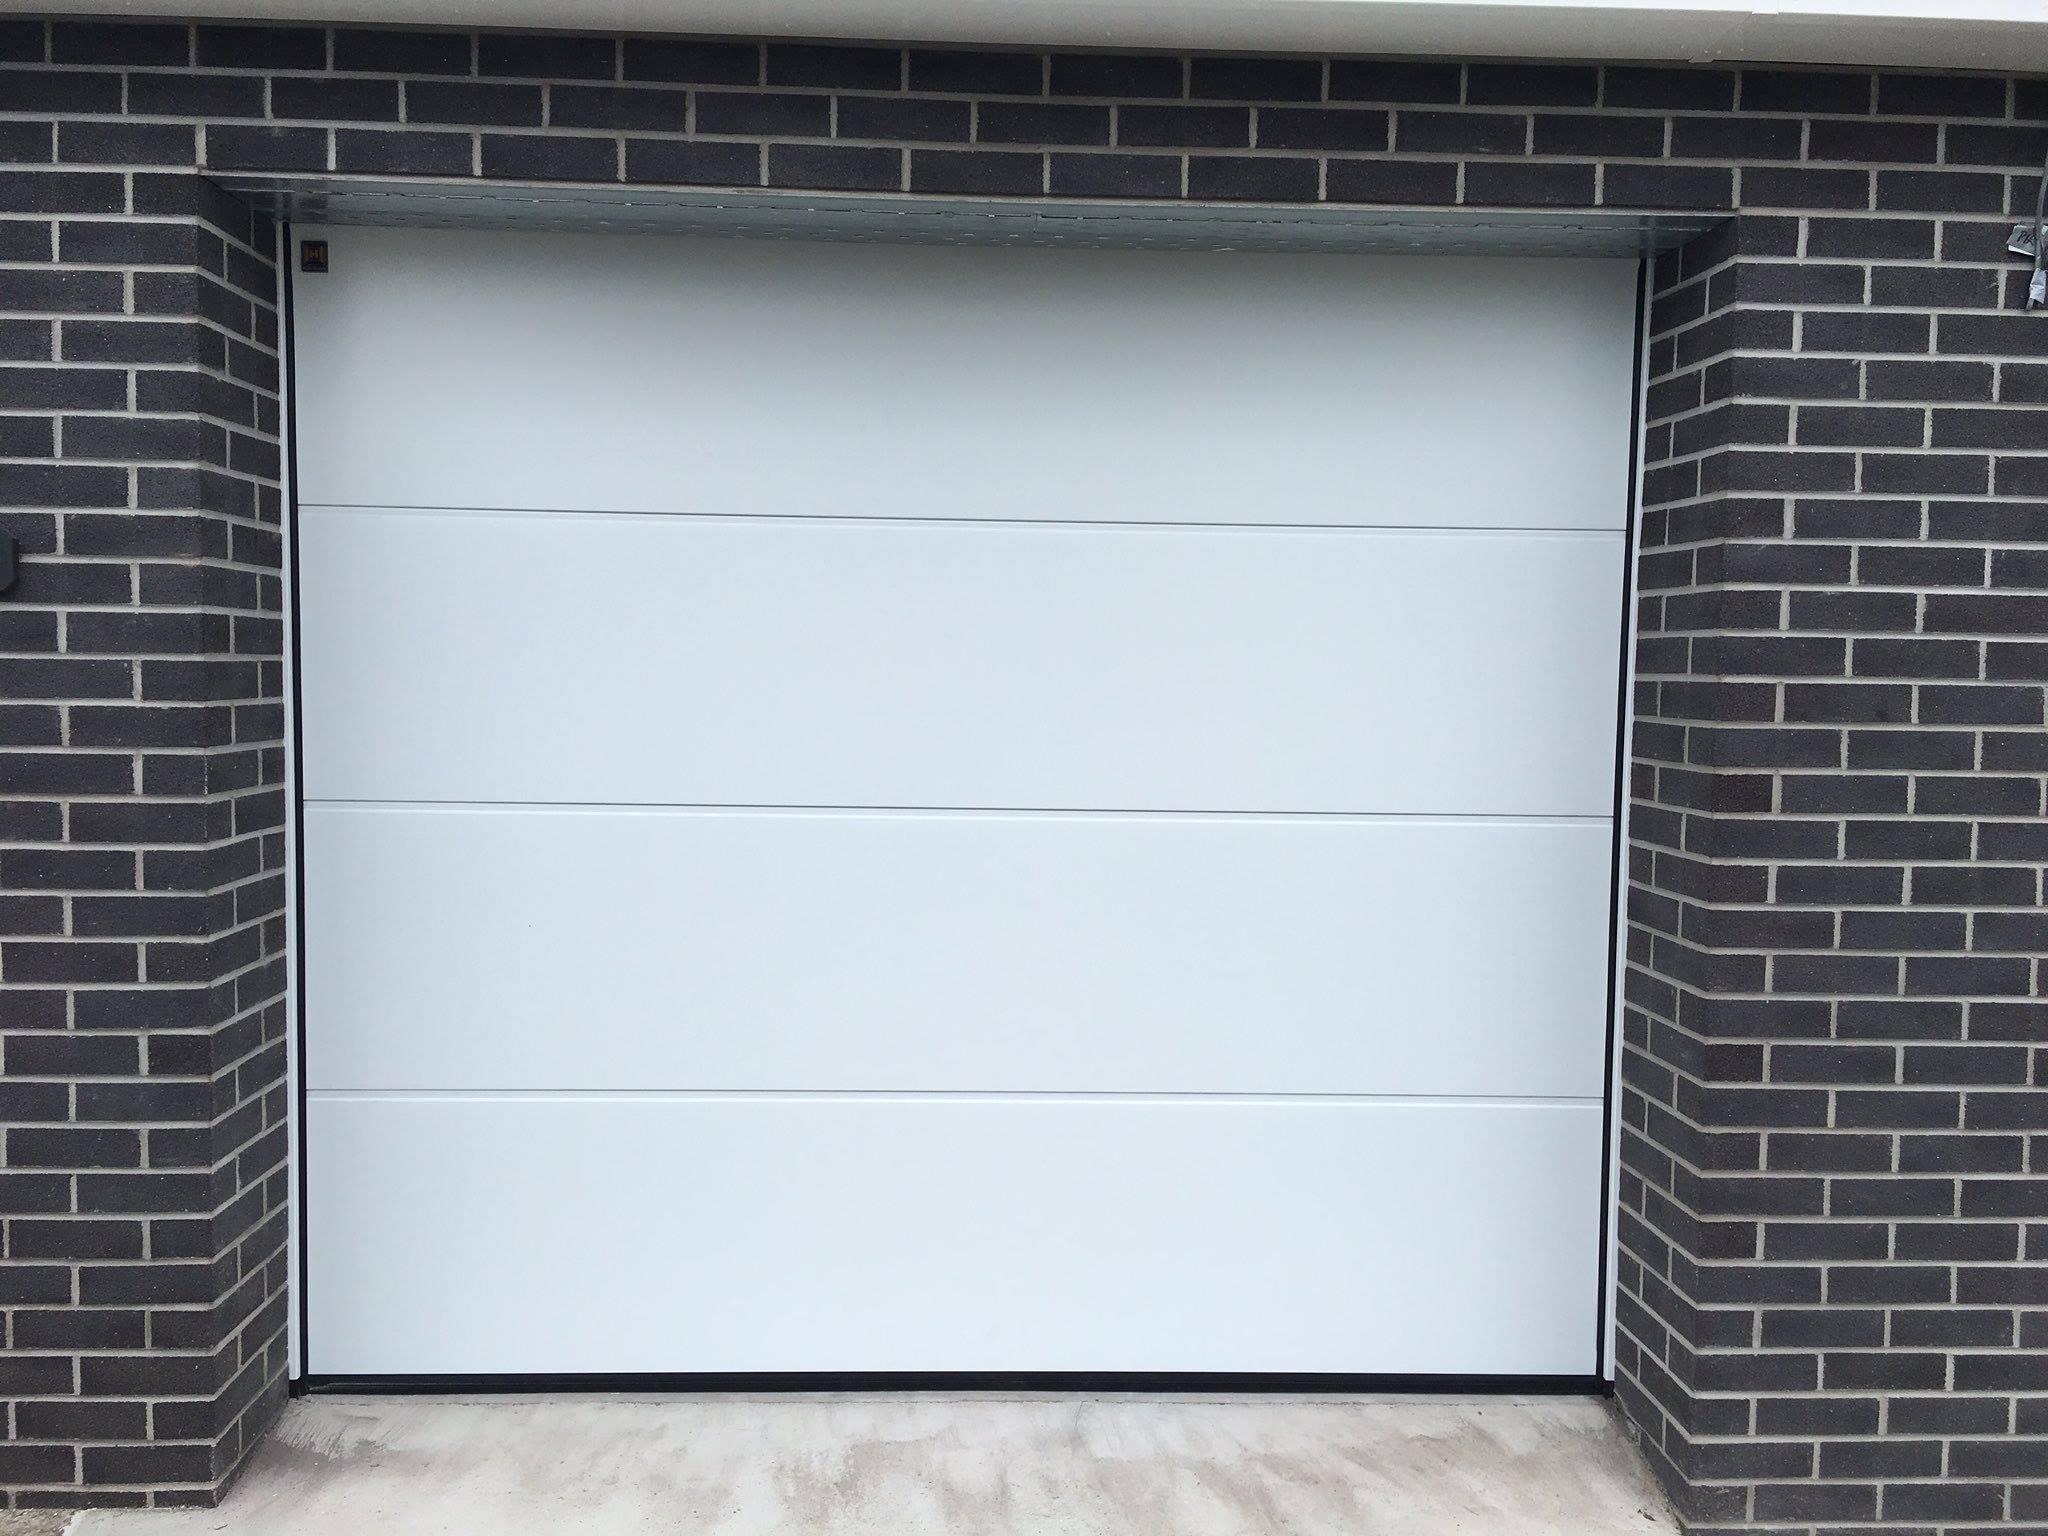 L Ribbed Sectional Garage Doors Electric Garage Doors In